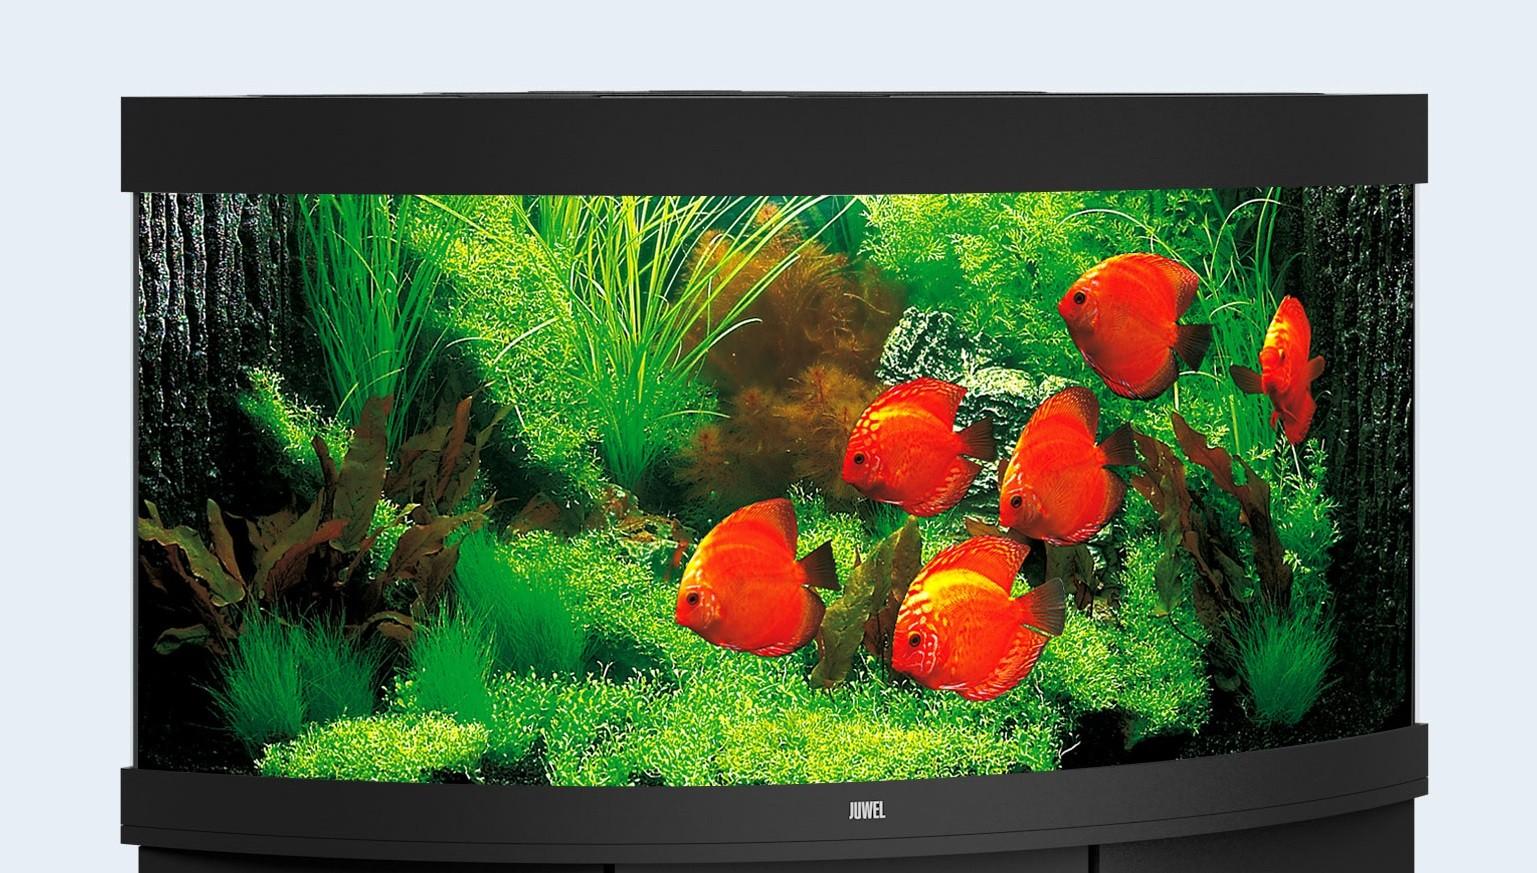 Juwel Trigon Akvarie 350 liter sort med Ledlys